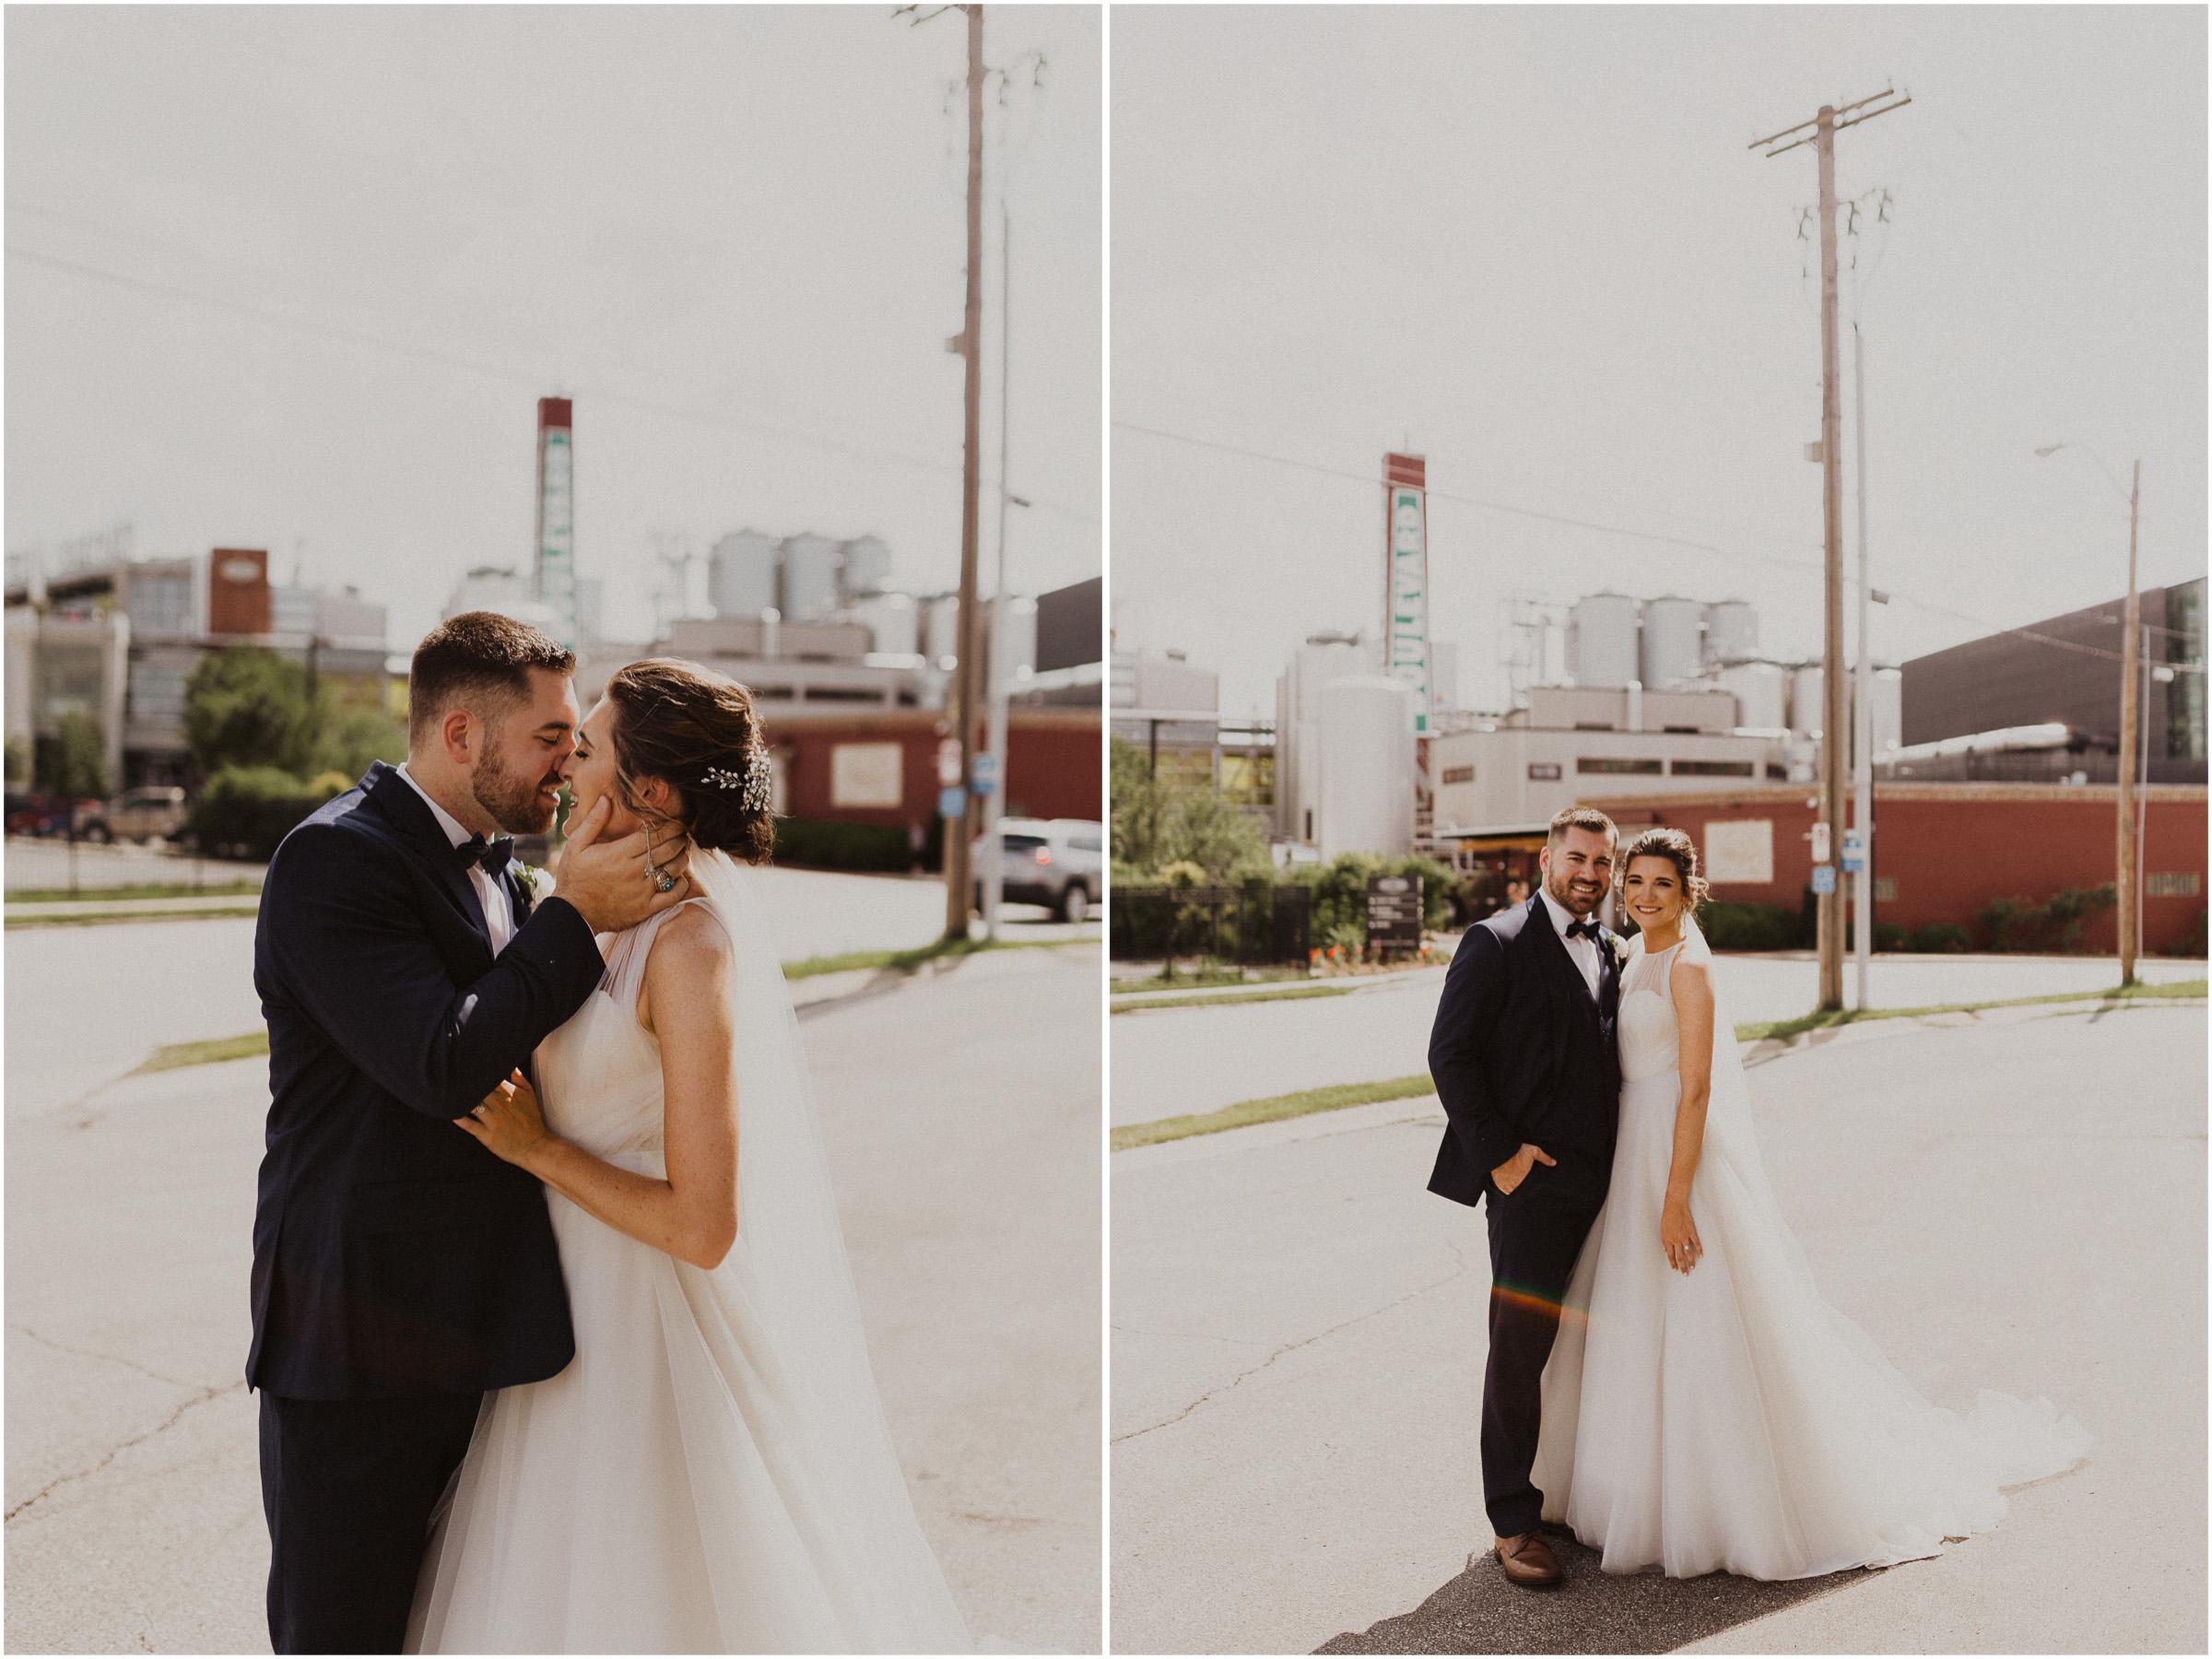 alyssa barletter photography classic downtown kansas city wedding boulevard brewery-27.jpg